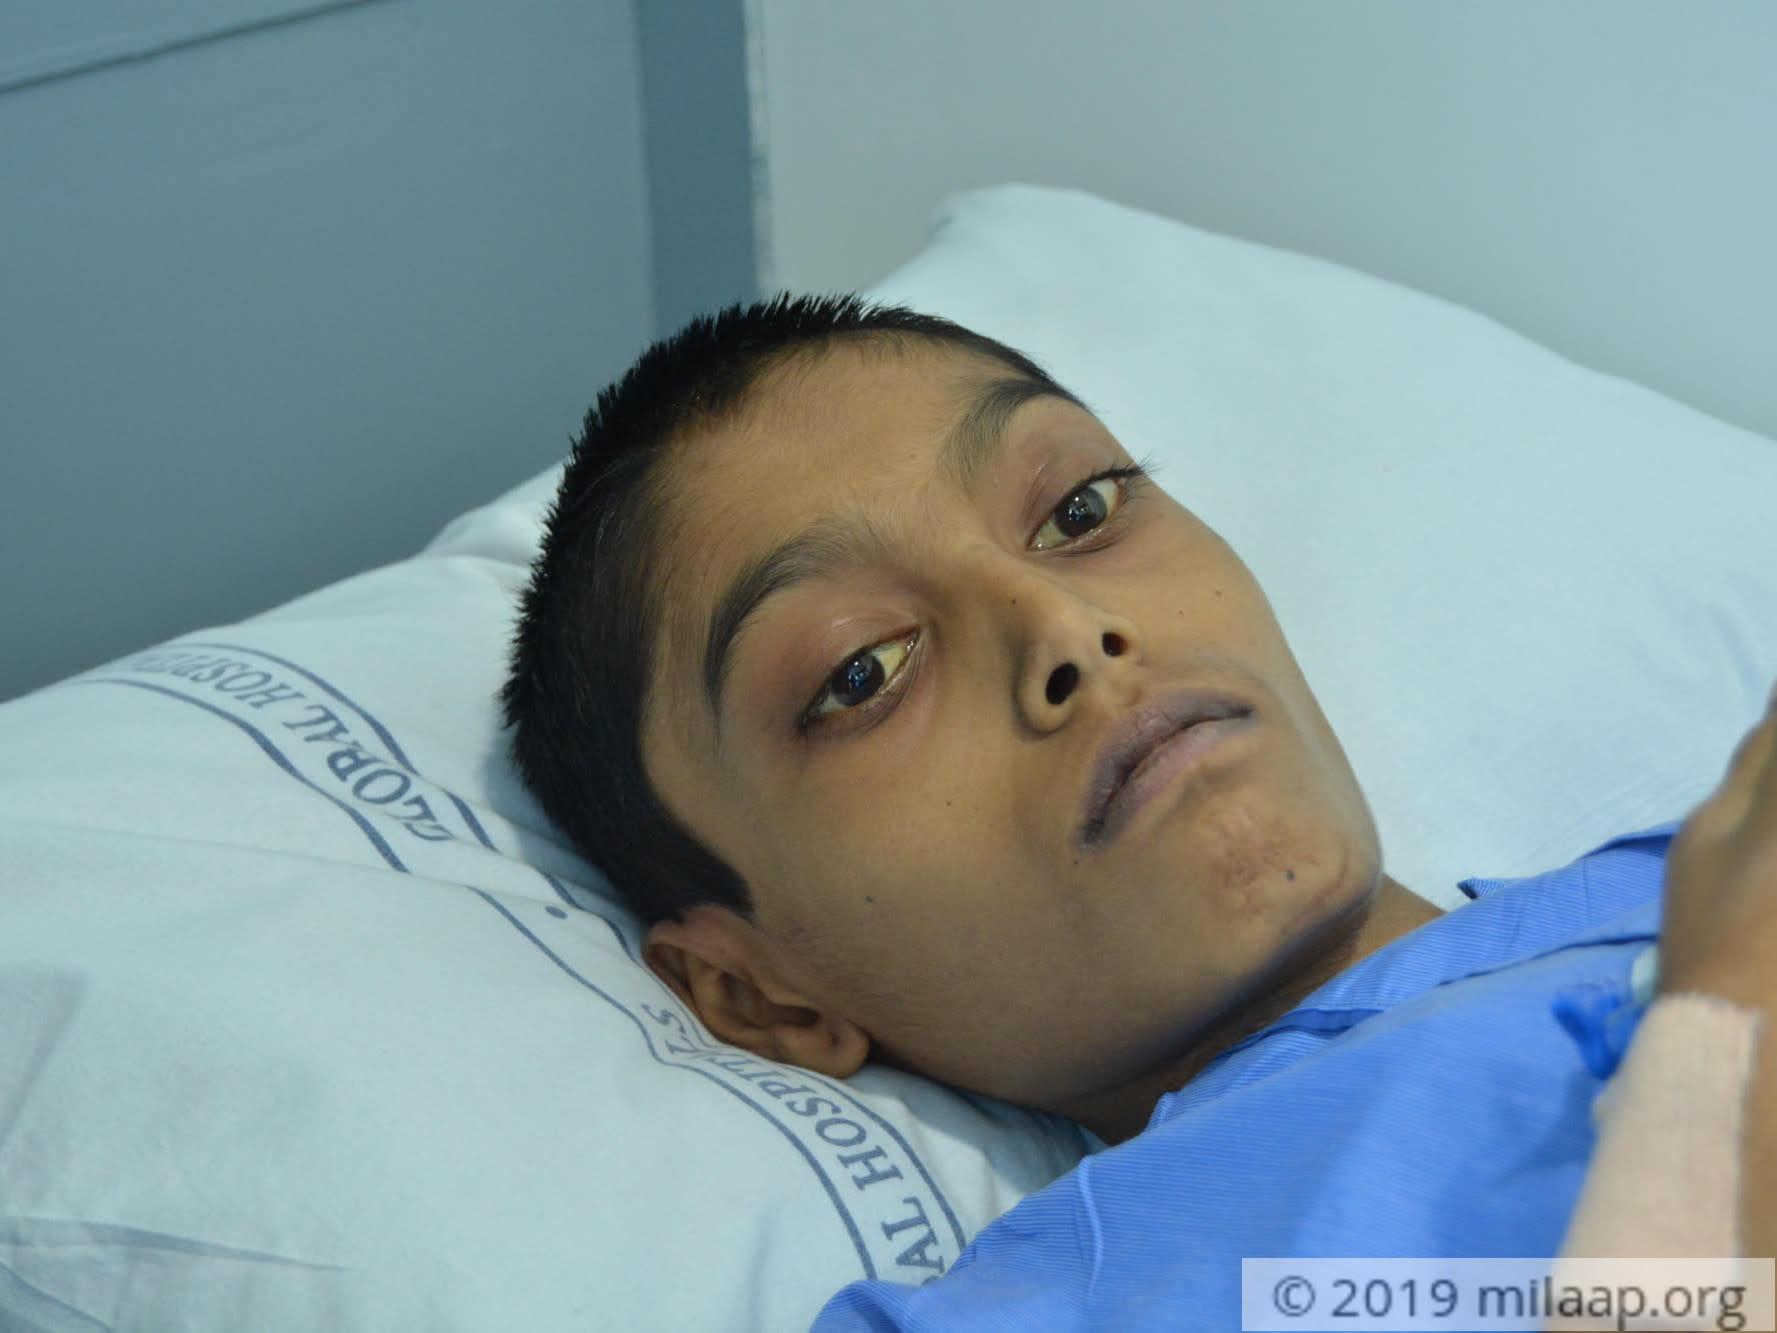 Jagdish global hospital 06 yeo9r6 1575114366 gdnvug 1575550580